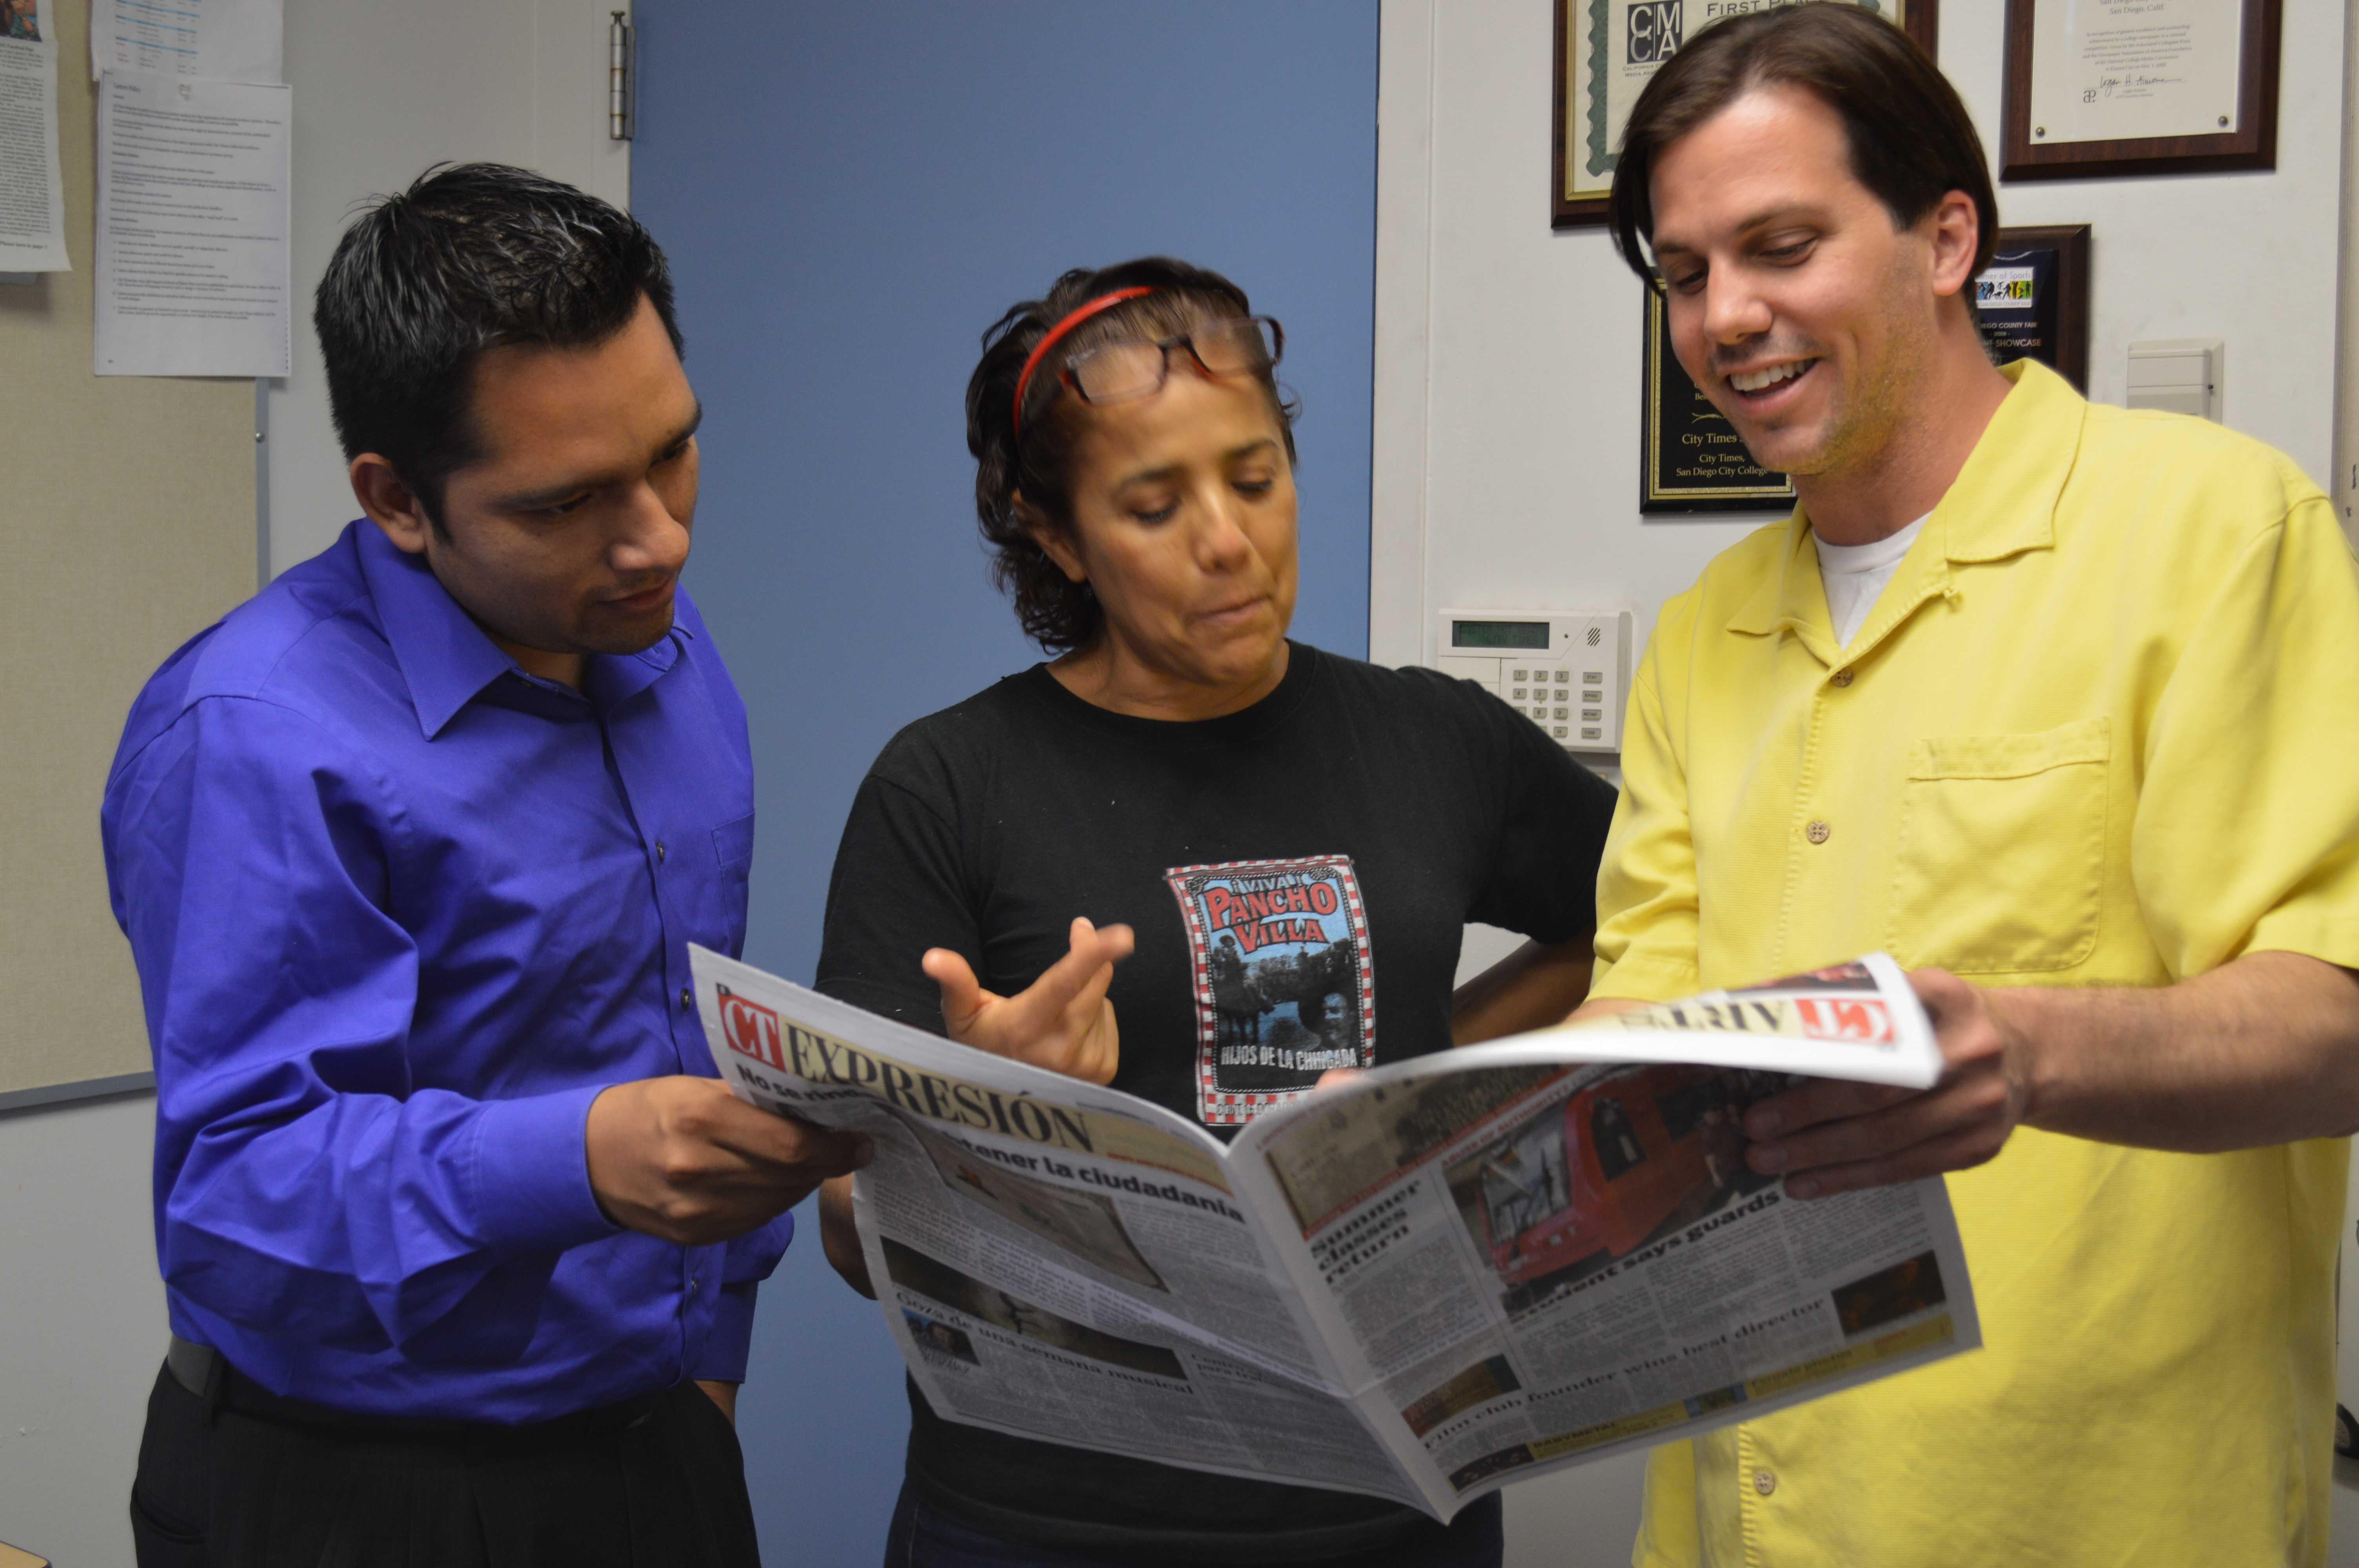 Antonio Marquez, left, Sandra Galindo and Chris Handloser won awards from the Journalism Association of Community Colleges. Photo credit: Michelle Moran